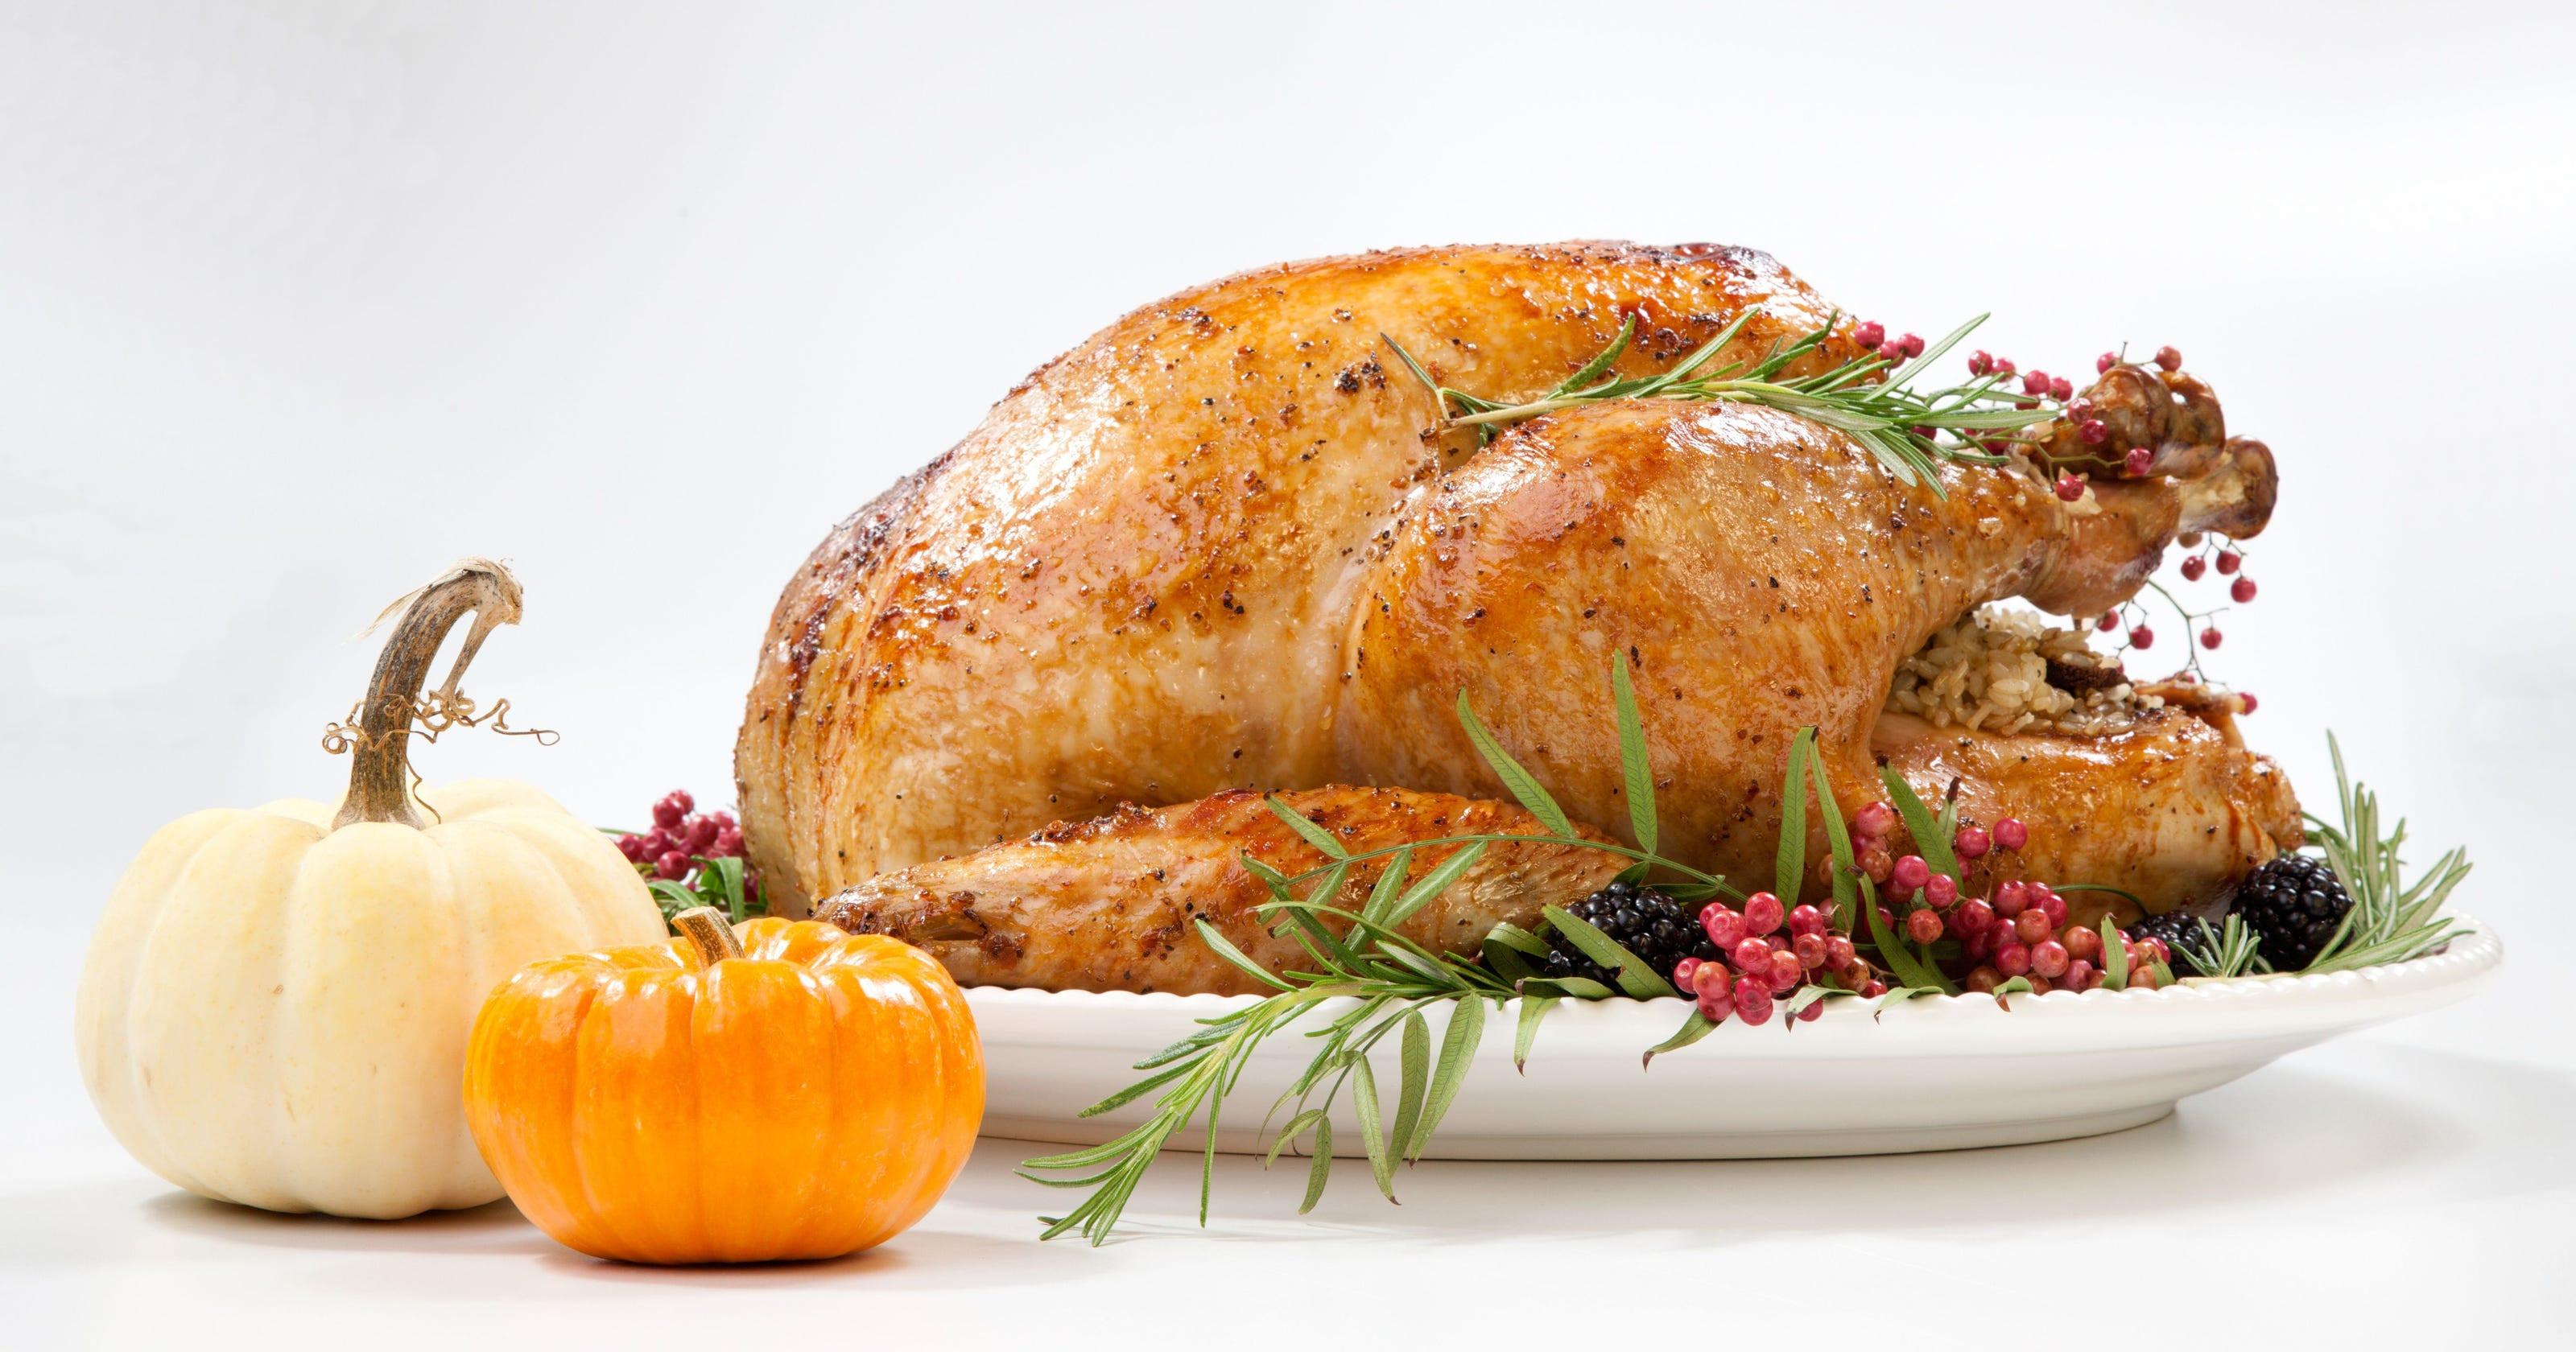 Best Turkey Brand For Thanksgiving  Turkey salmonella outbreak Why USDA isn t release brand names